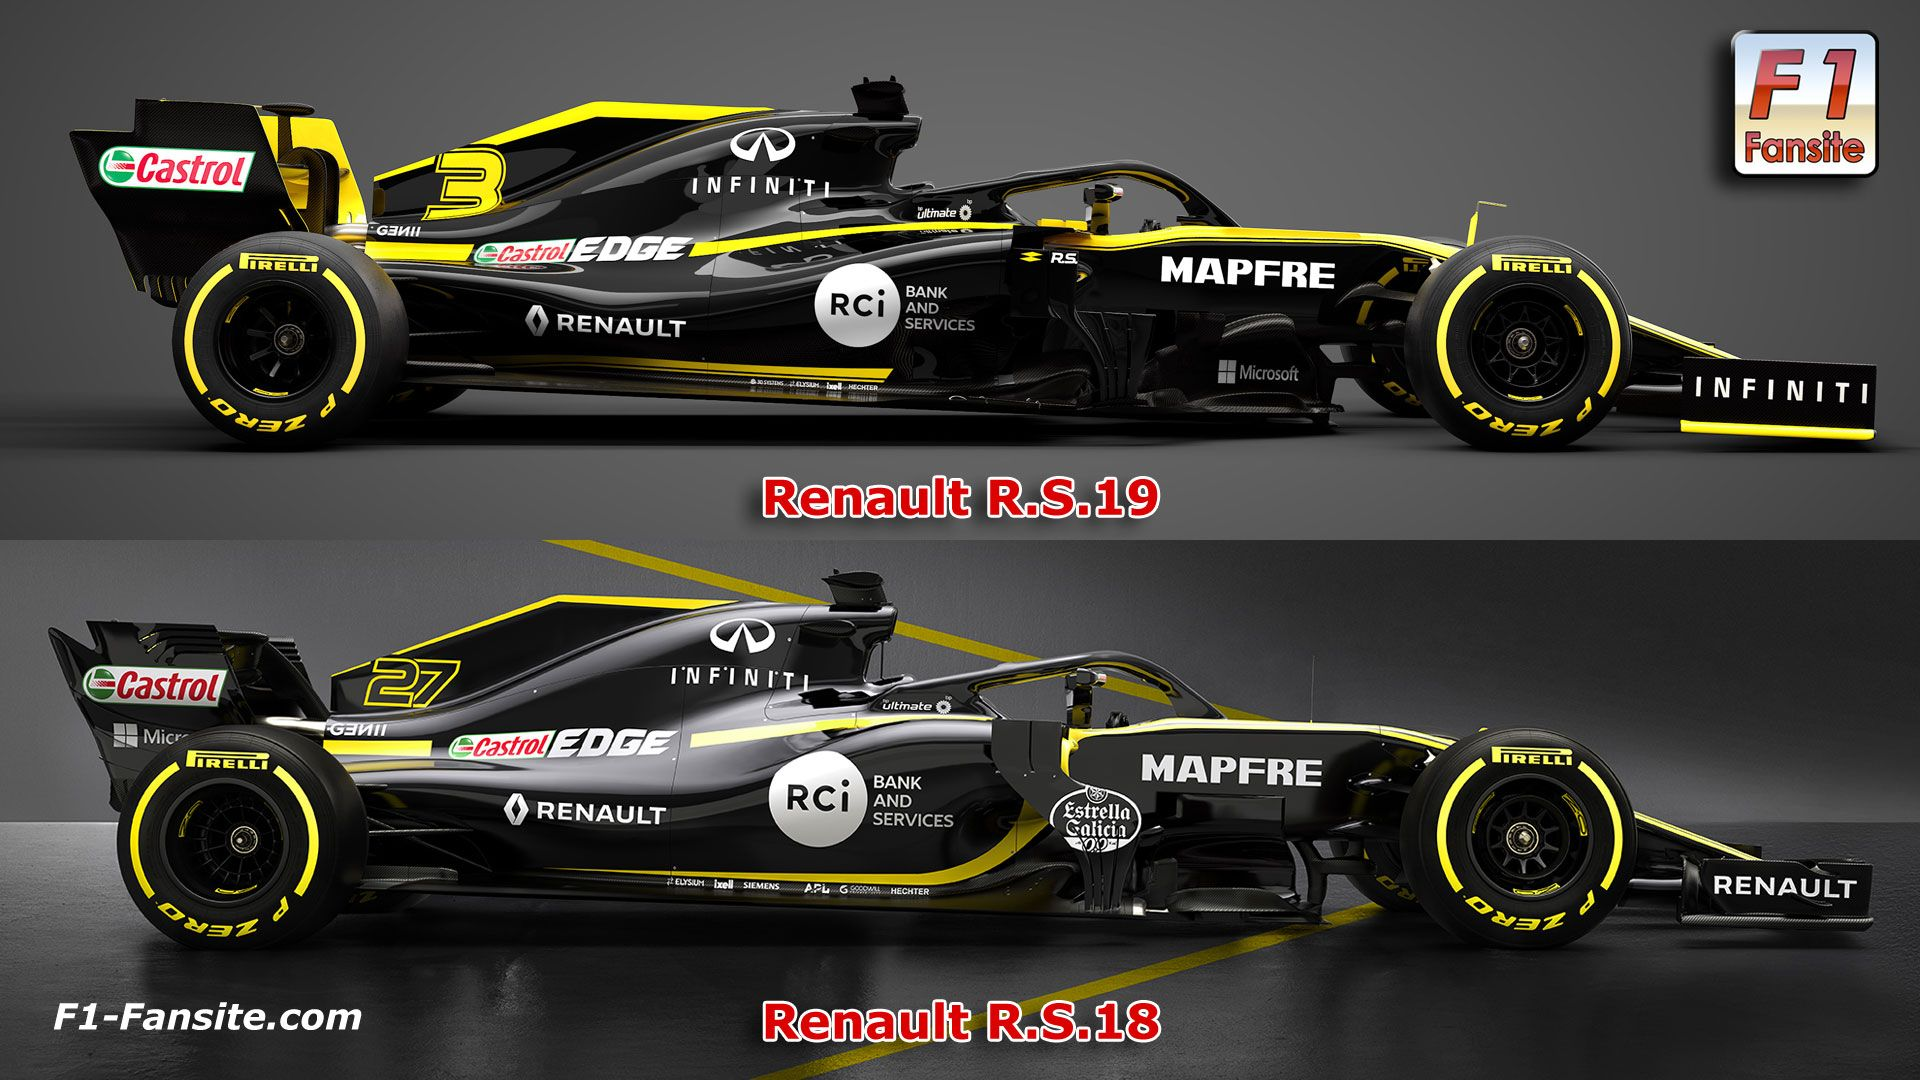 Renault R S 19 Launch F1 team interviews | F1-Fansite com